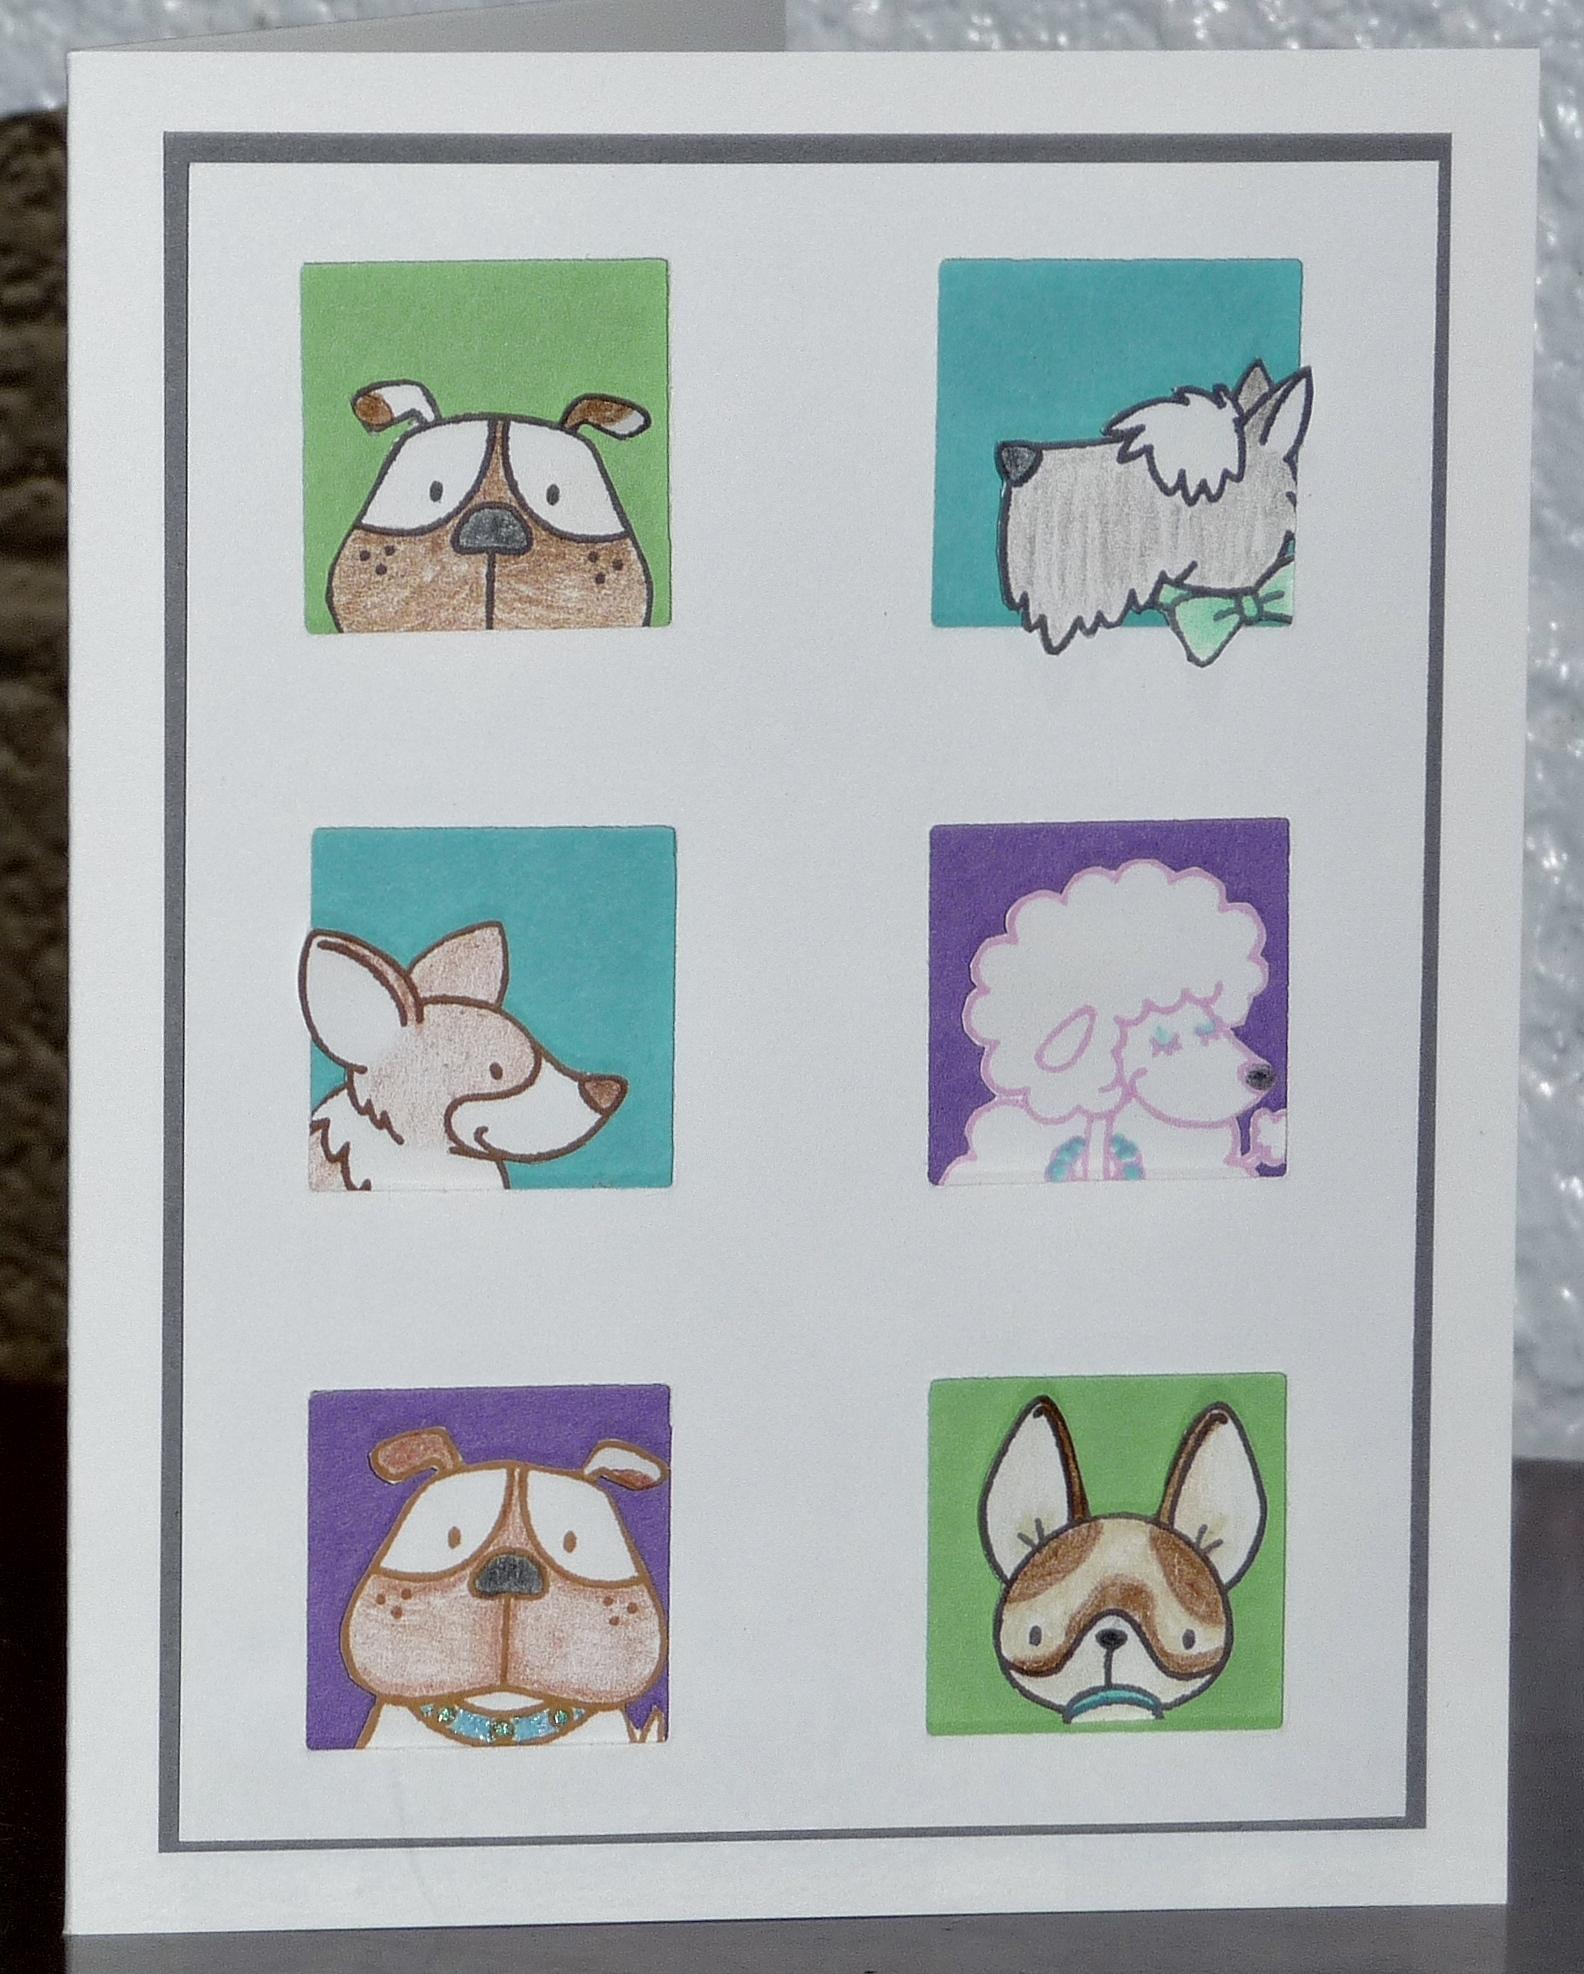 10-12-18 MFT Color Sketch